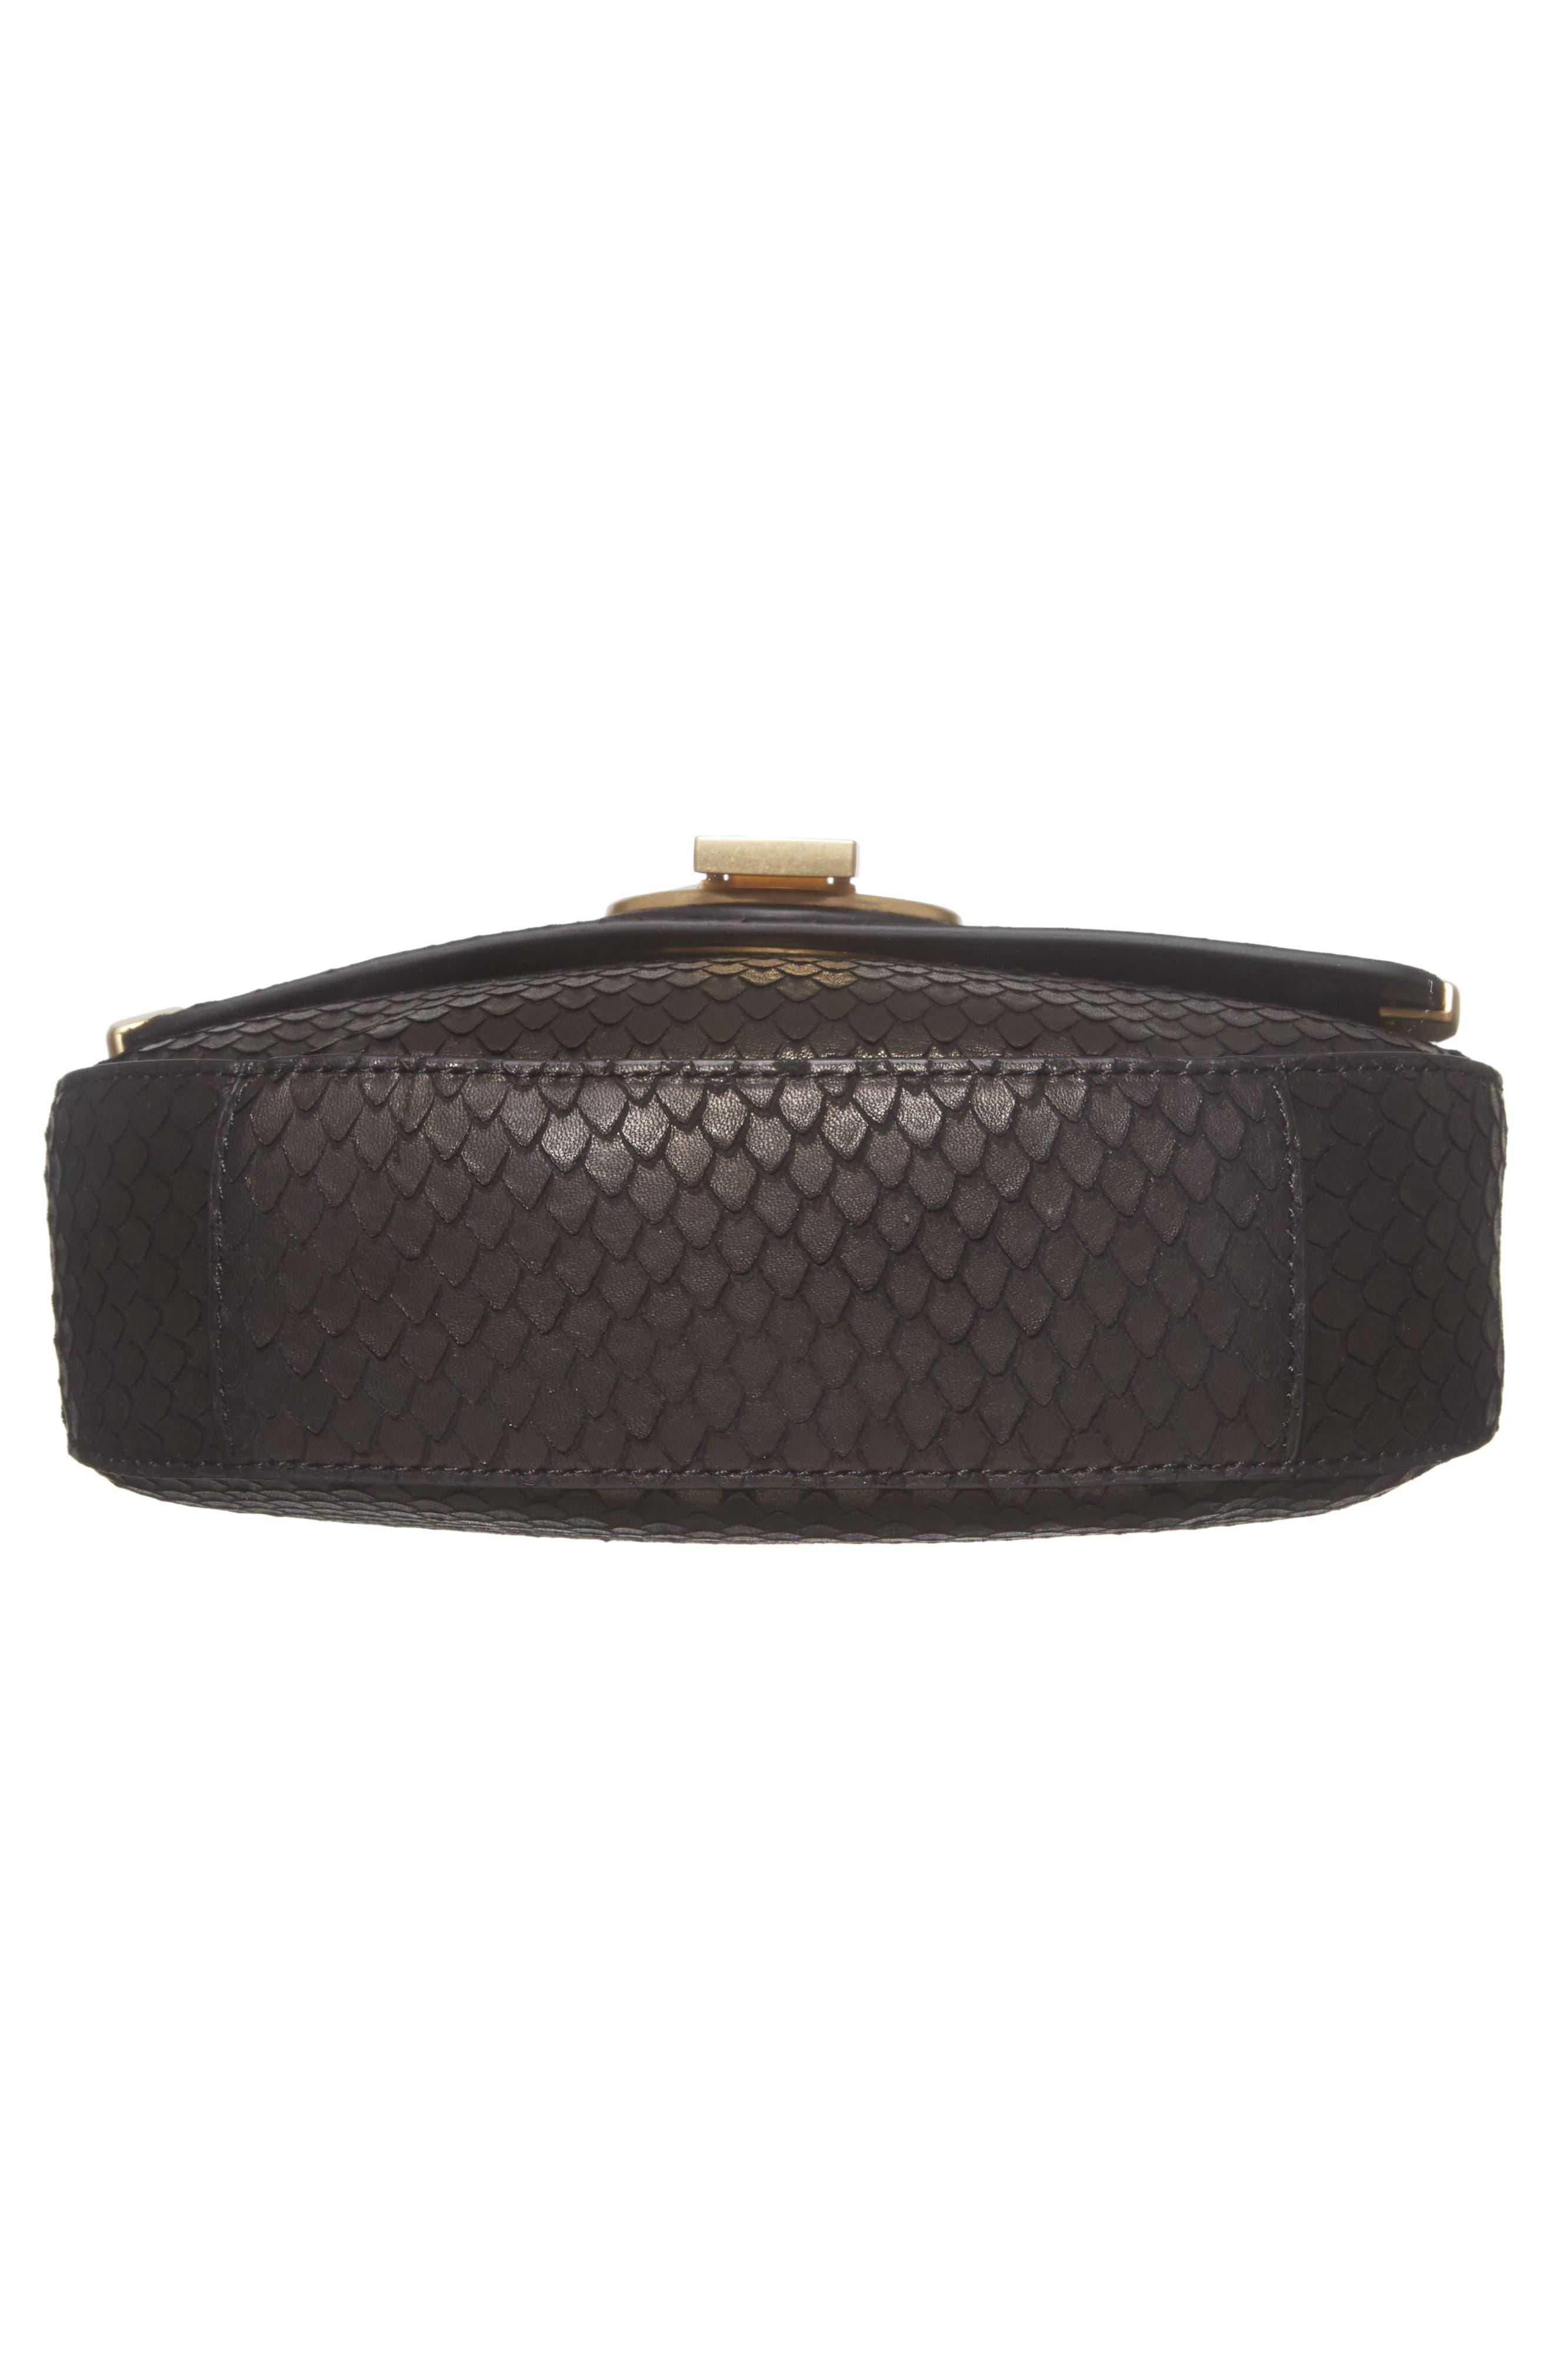 Céline Dion Octave Leather Crossbody Bag,                             Alternate thumbnail 6, color,                             Black Snake